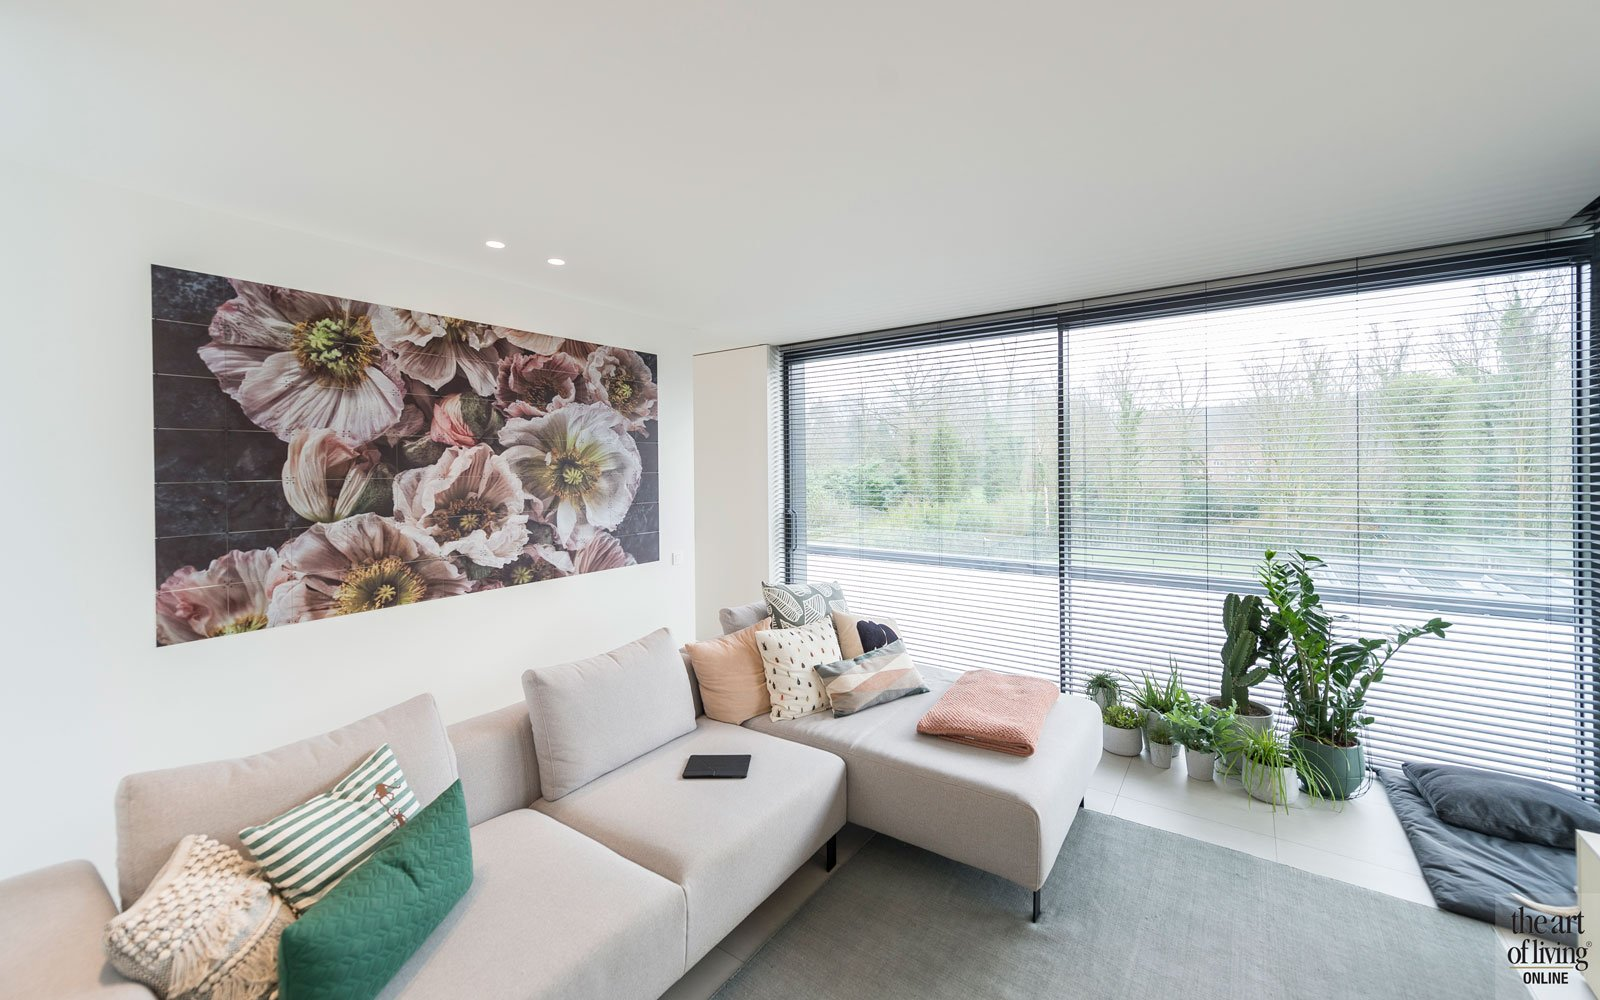 Appartement, woonkamer, living, lounge, grote ramen, groepspraktijk, Jelle Vandecasteele